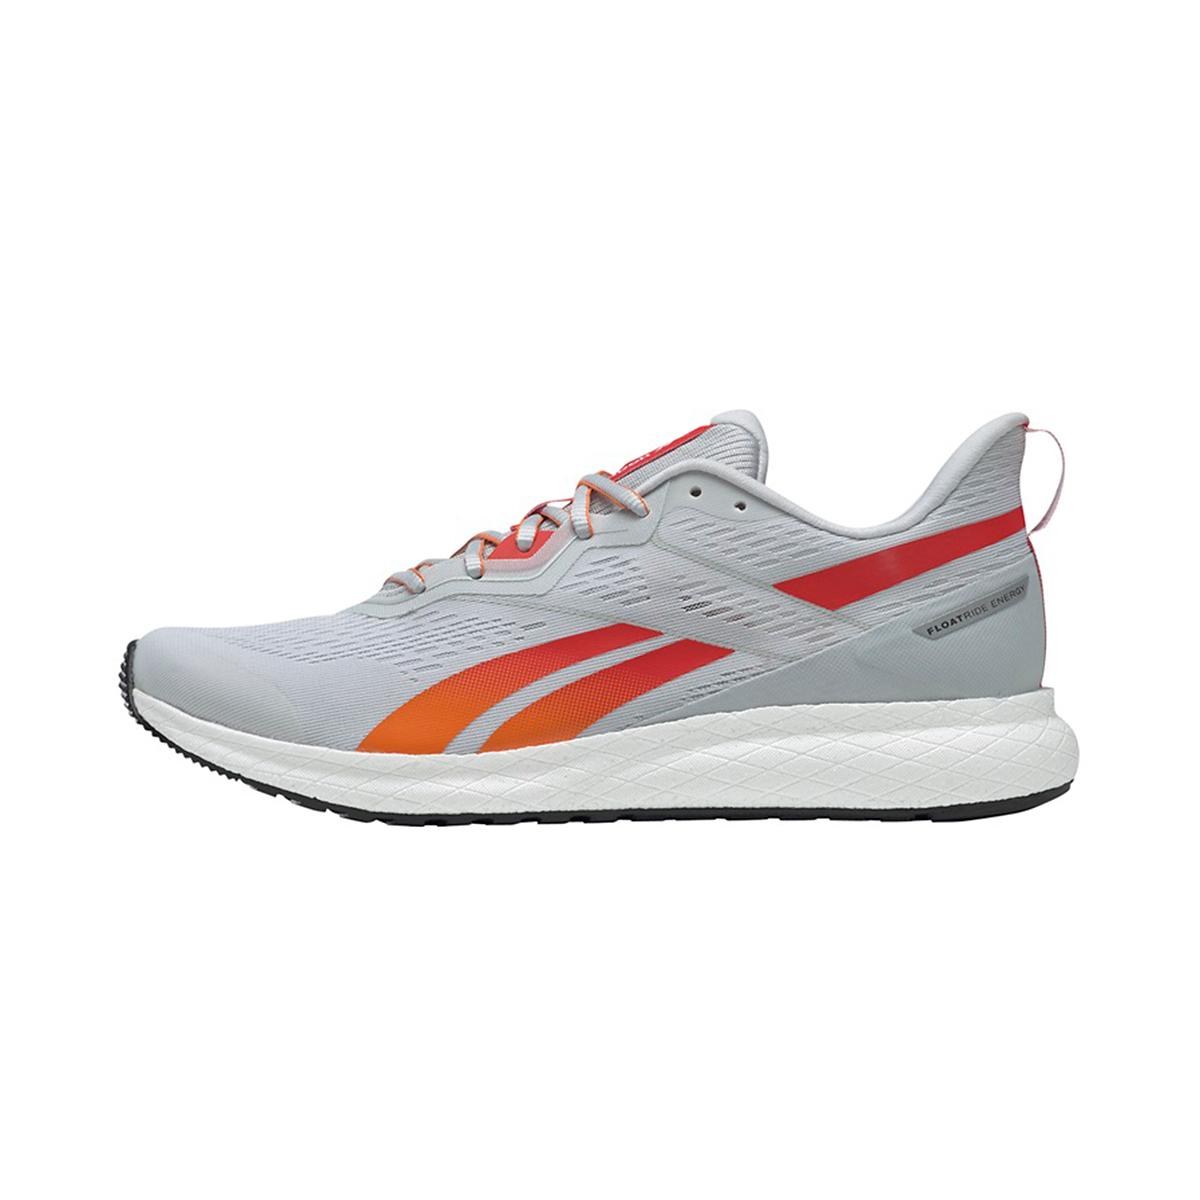 Men's Reebok Forever Floatride Energy 2.0 Running Shoe - Color: Pure Grey/White/High Vis Orange - Size: 7 - Width: Regular, Pure Grey/White/High Vis Orange, large, image 2